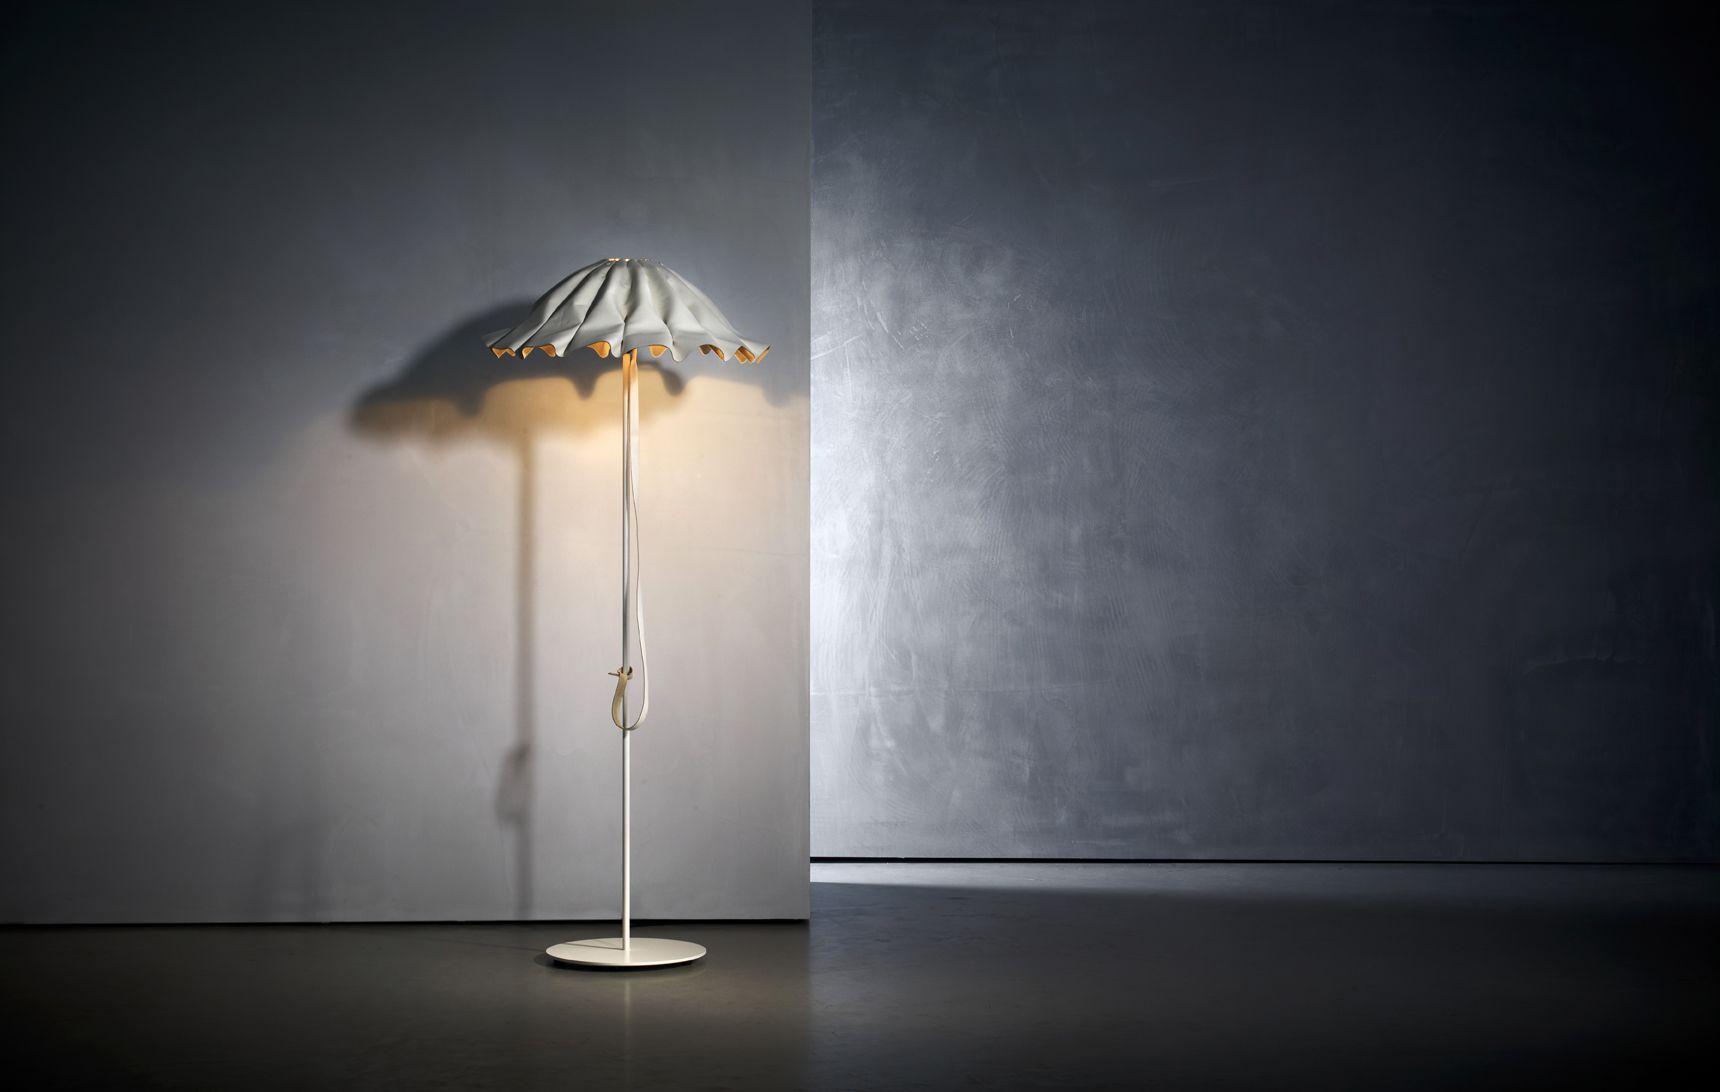 Piet Boon Lampen : Piet boon lighting by maretti lude floor lude piet boon